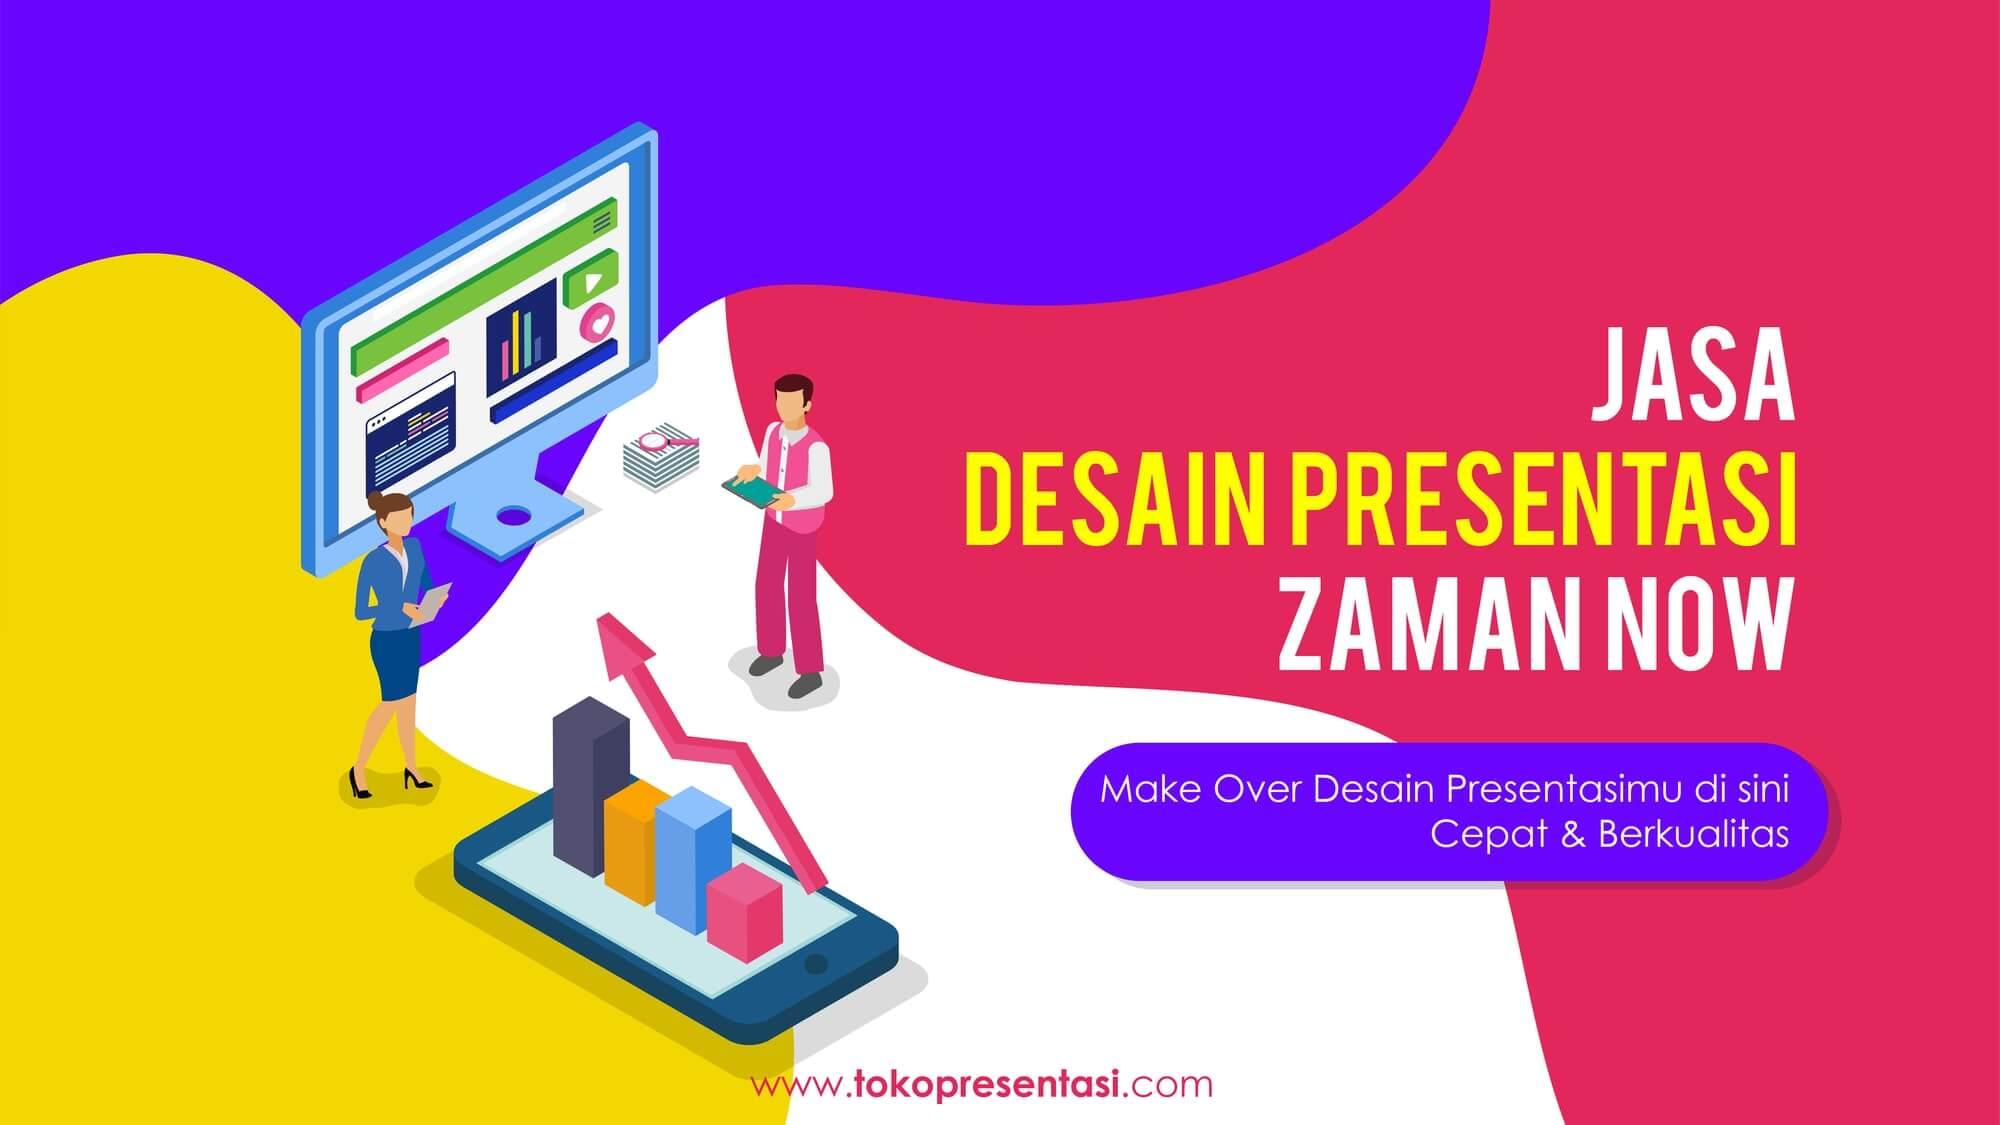 Jasa Pembuatan Desain Presentasi Powerpoint Lomba Inovasi GKM WKM TKMPN Philips Moris Indonesia Tokopresentasi